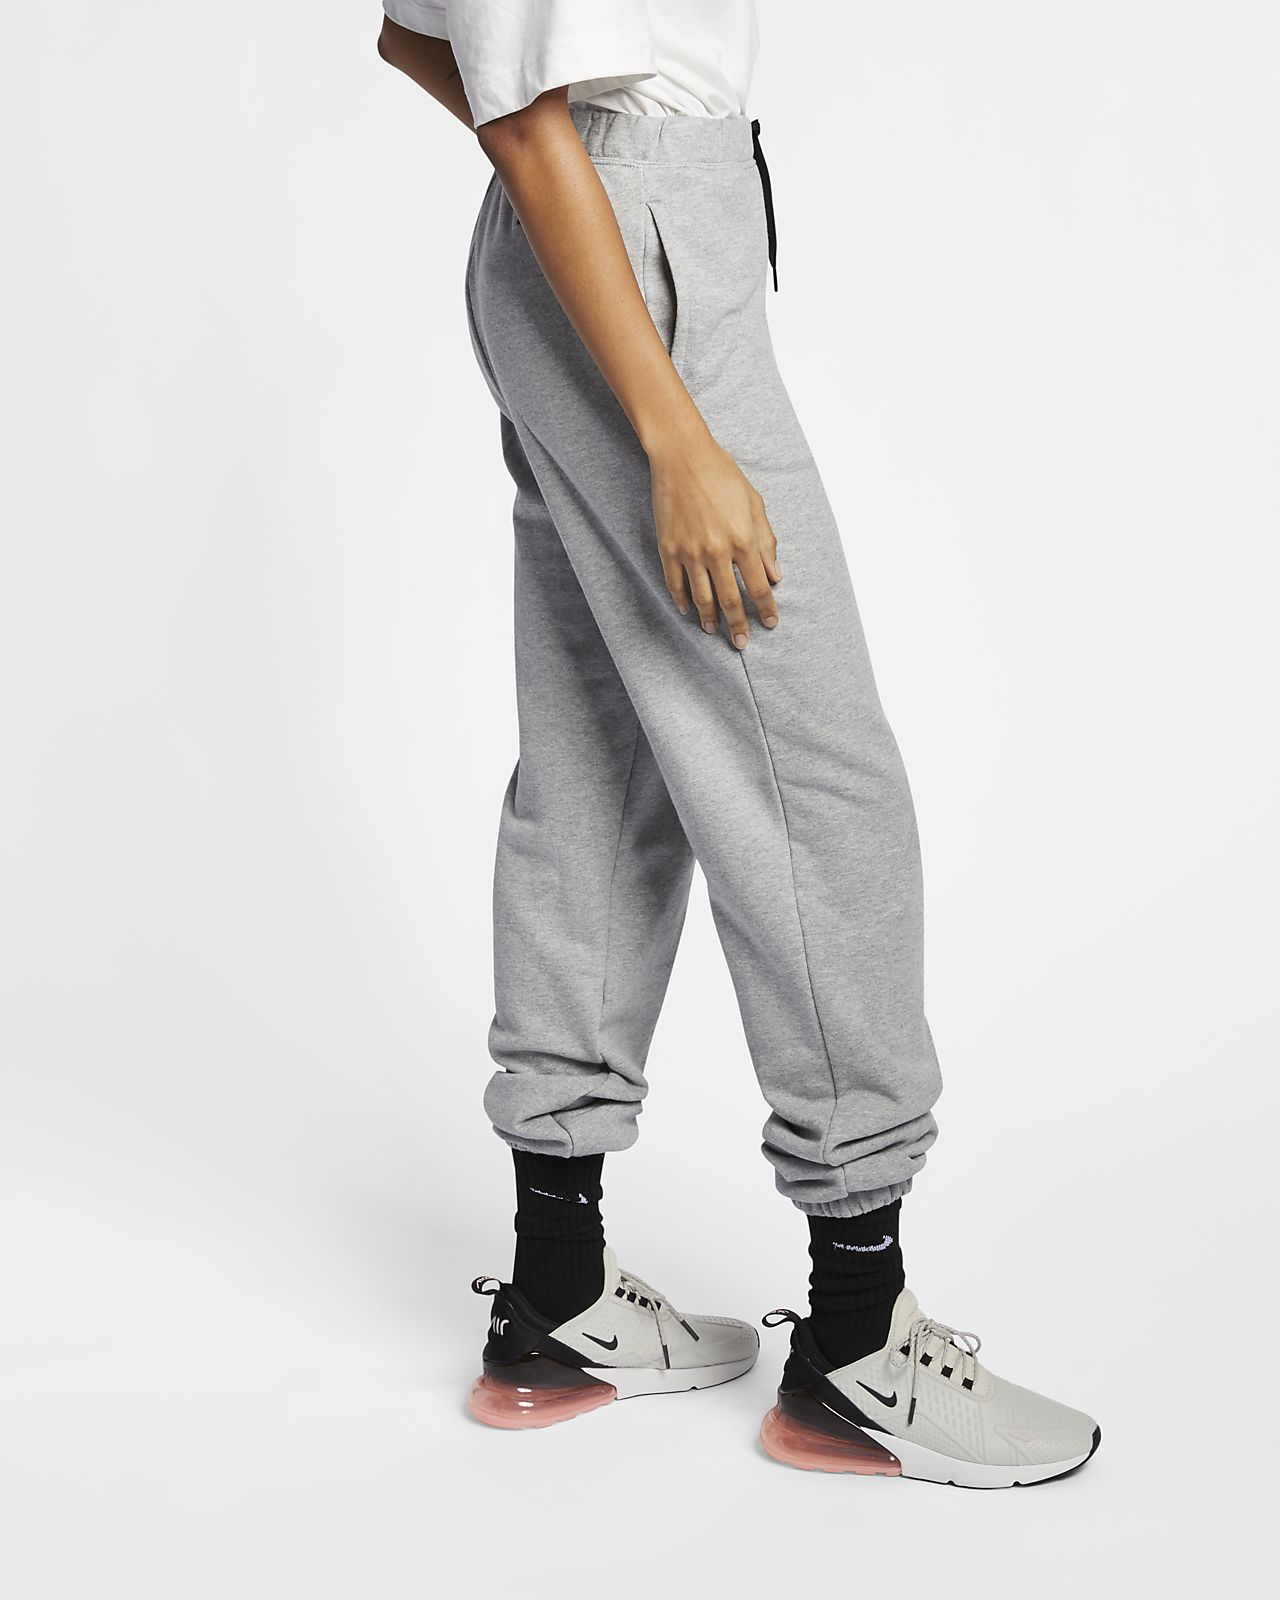 d83269aee8883 Nike Sportswear NSW Women's French Terry Pants. Nike.com